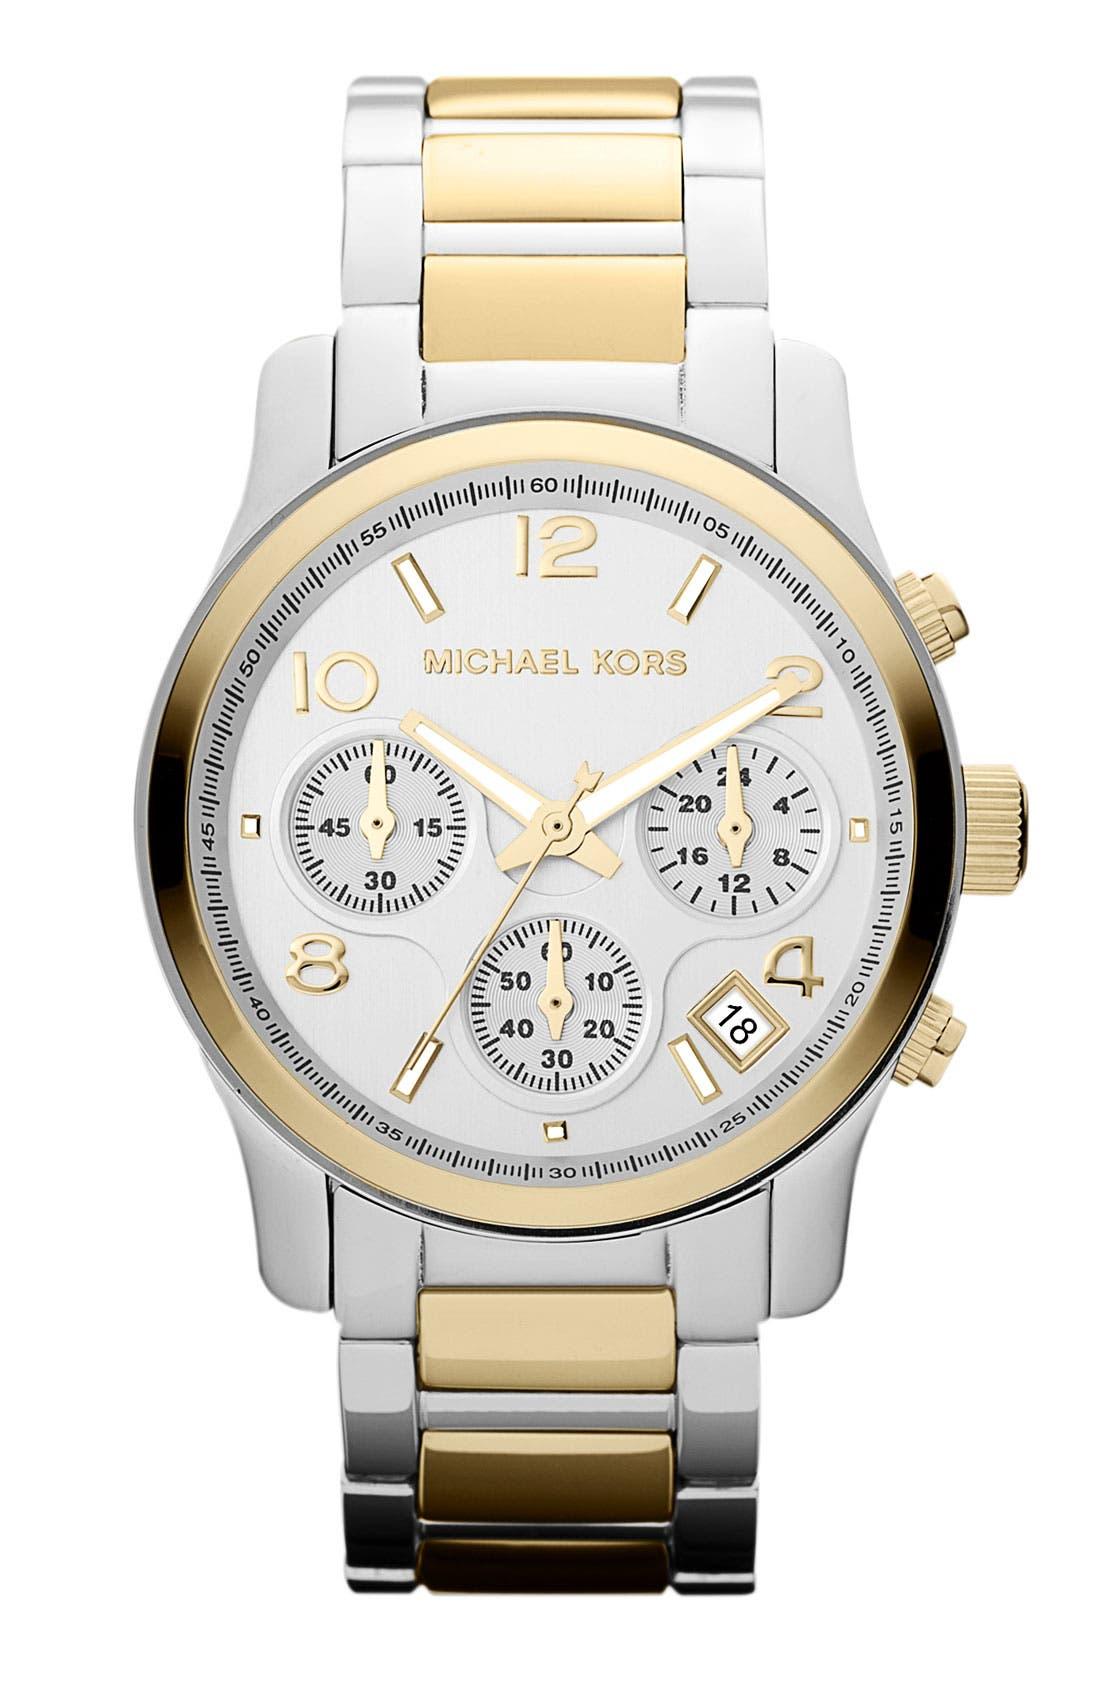 Main Image - Michael Kors 'Runway' Chronograph Watch, 38mm